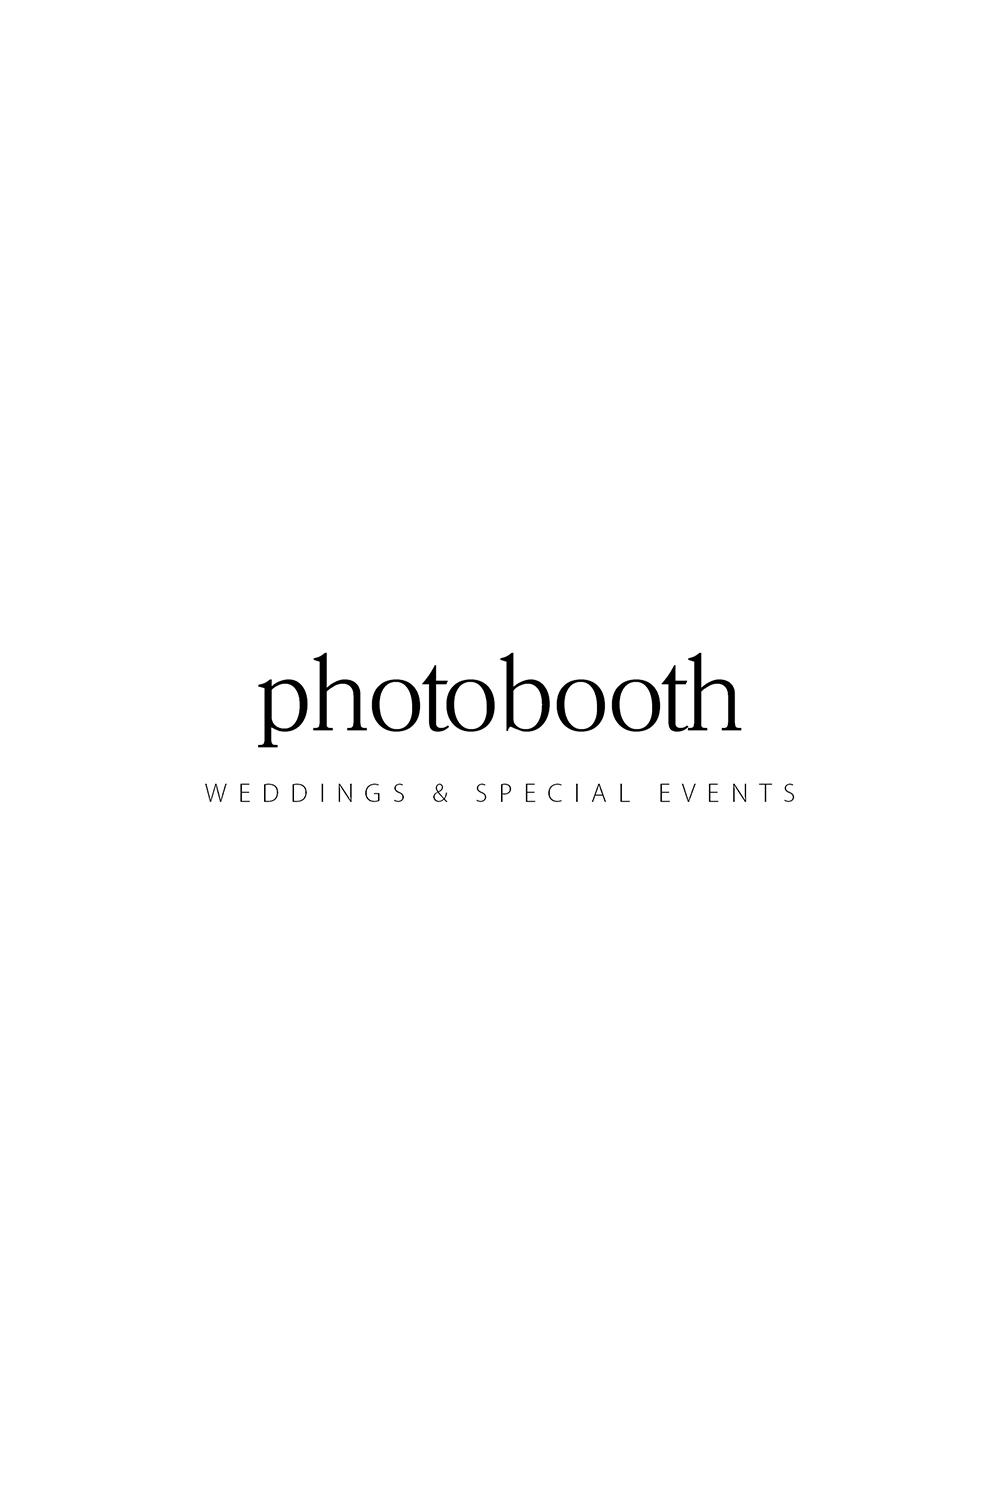 photbooth.jpg